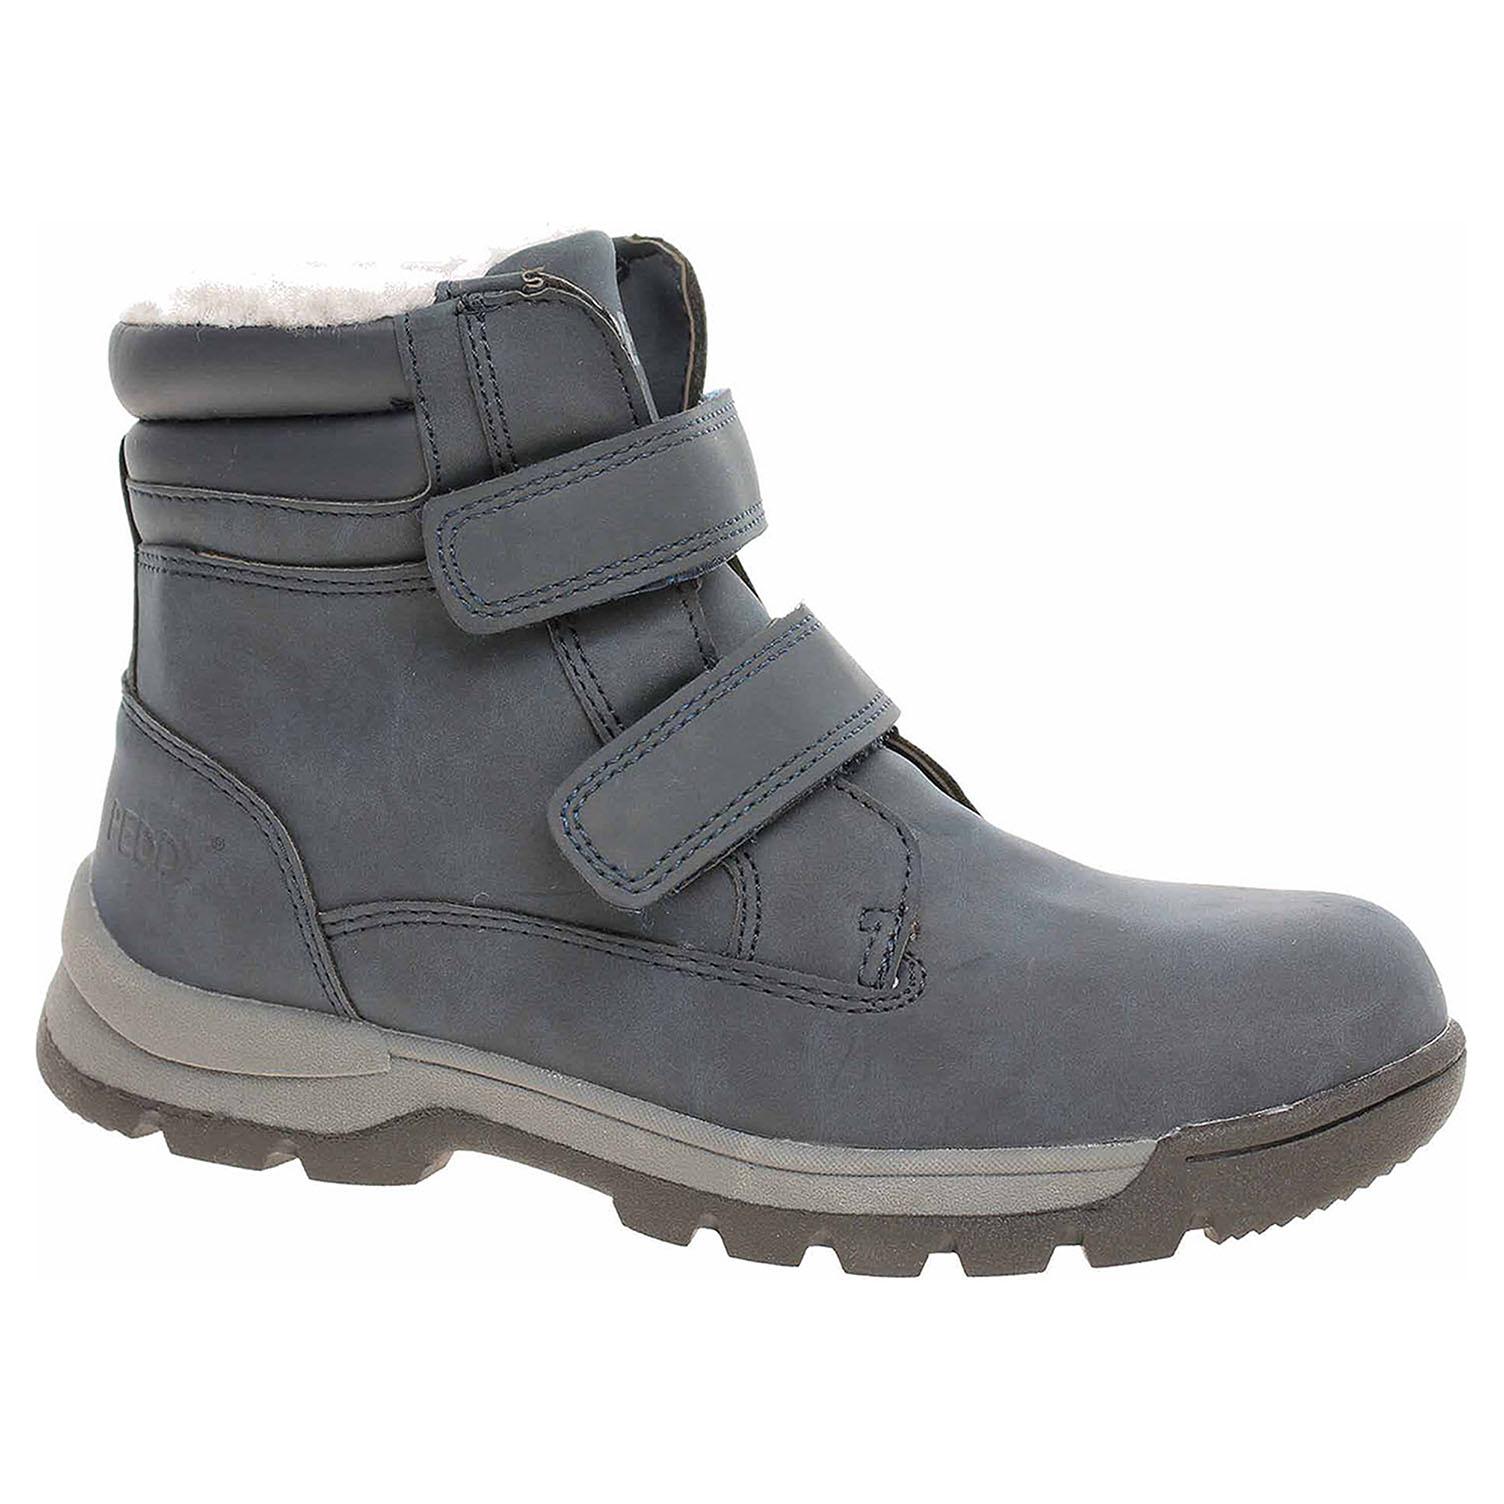 d151fd89cffd Ecco Chlapecká kotníková obuv Peddy P1-536-37-05 navy 29400107